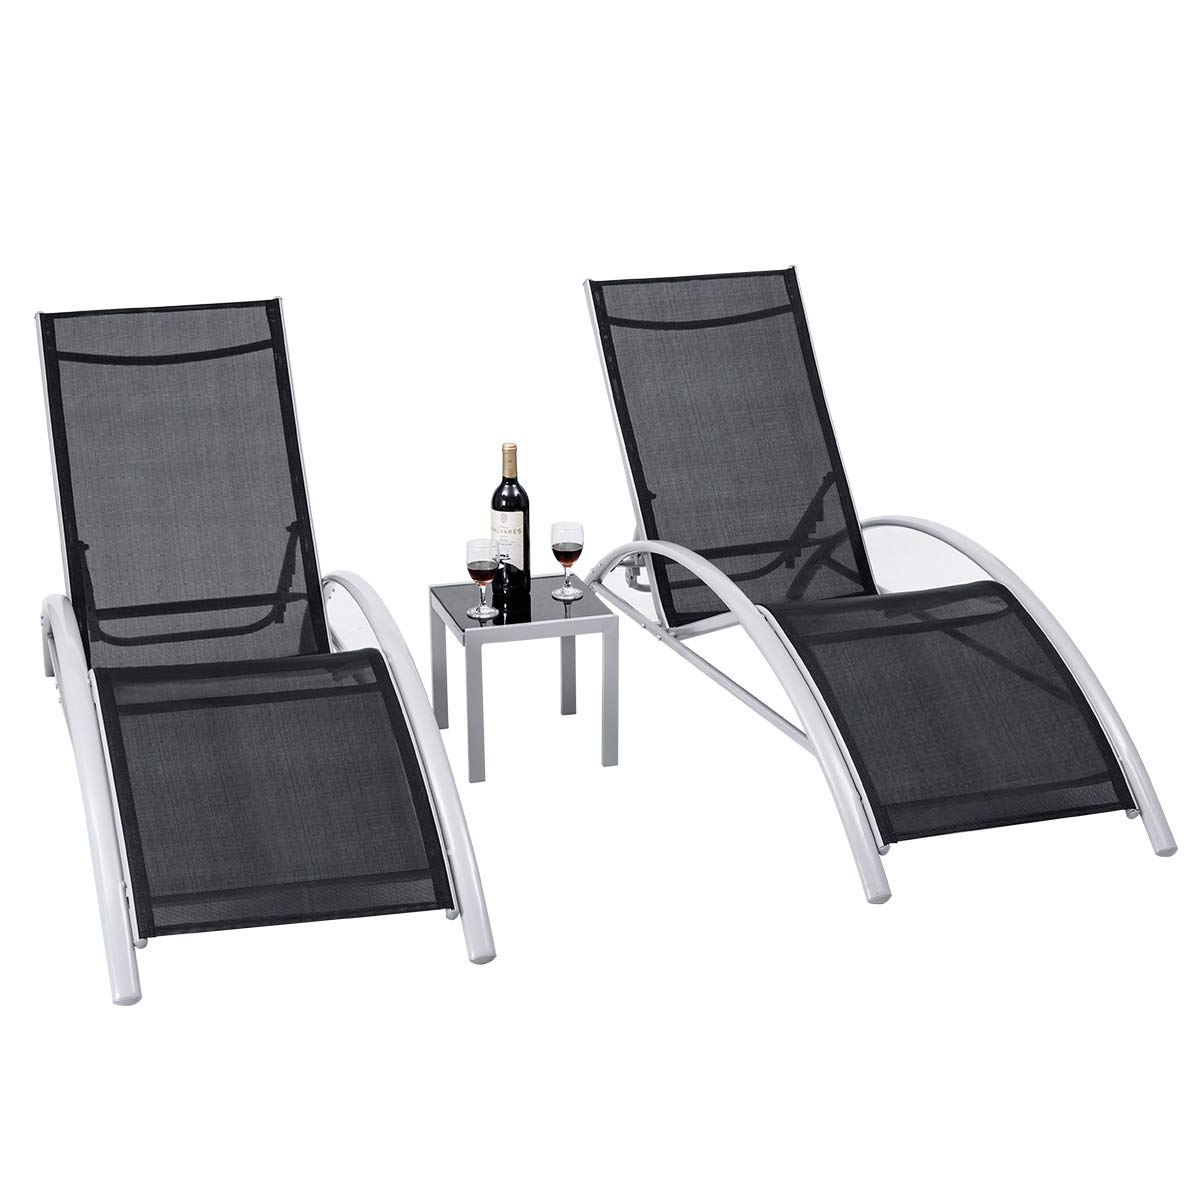 Giantex 3-Piece Chaise Lounge Set Aluminum Frame for Outdoor Patio Garden Yard Pool Furniture Adjustable Chaise Lounge Chairs (Black) by Giantex